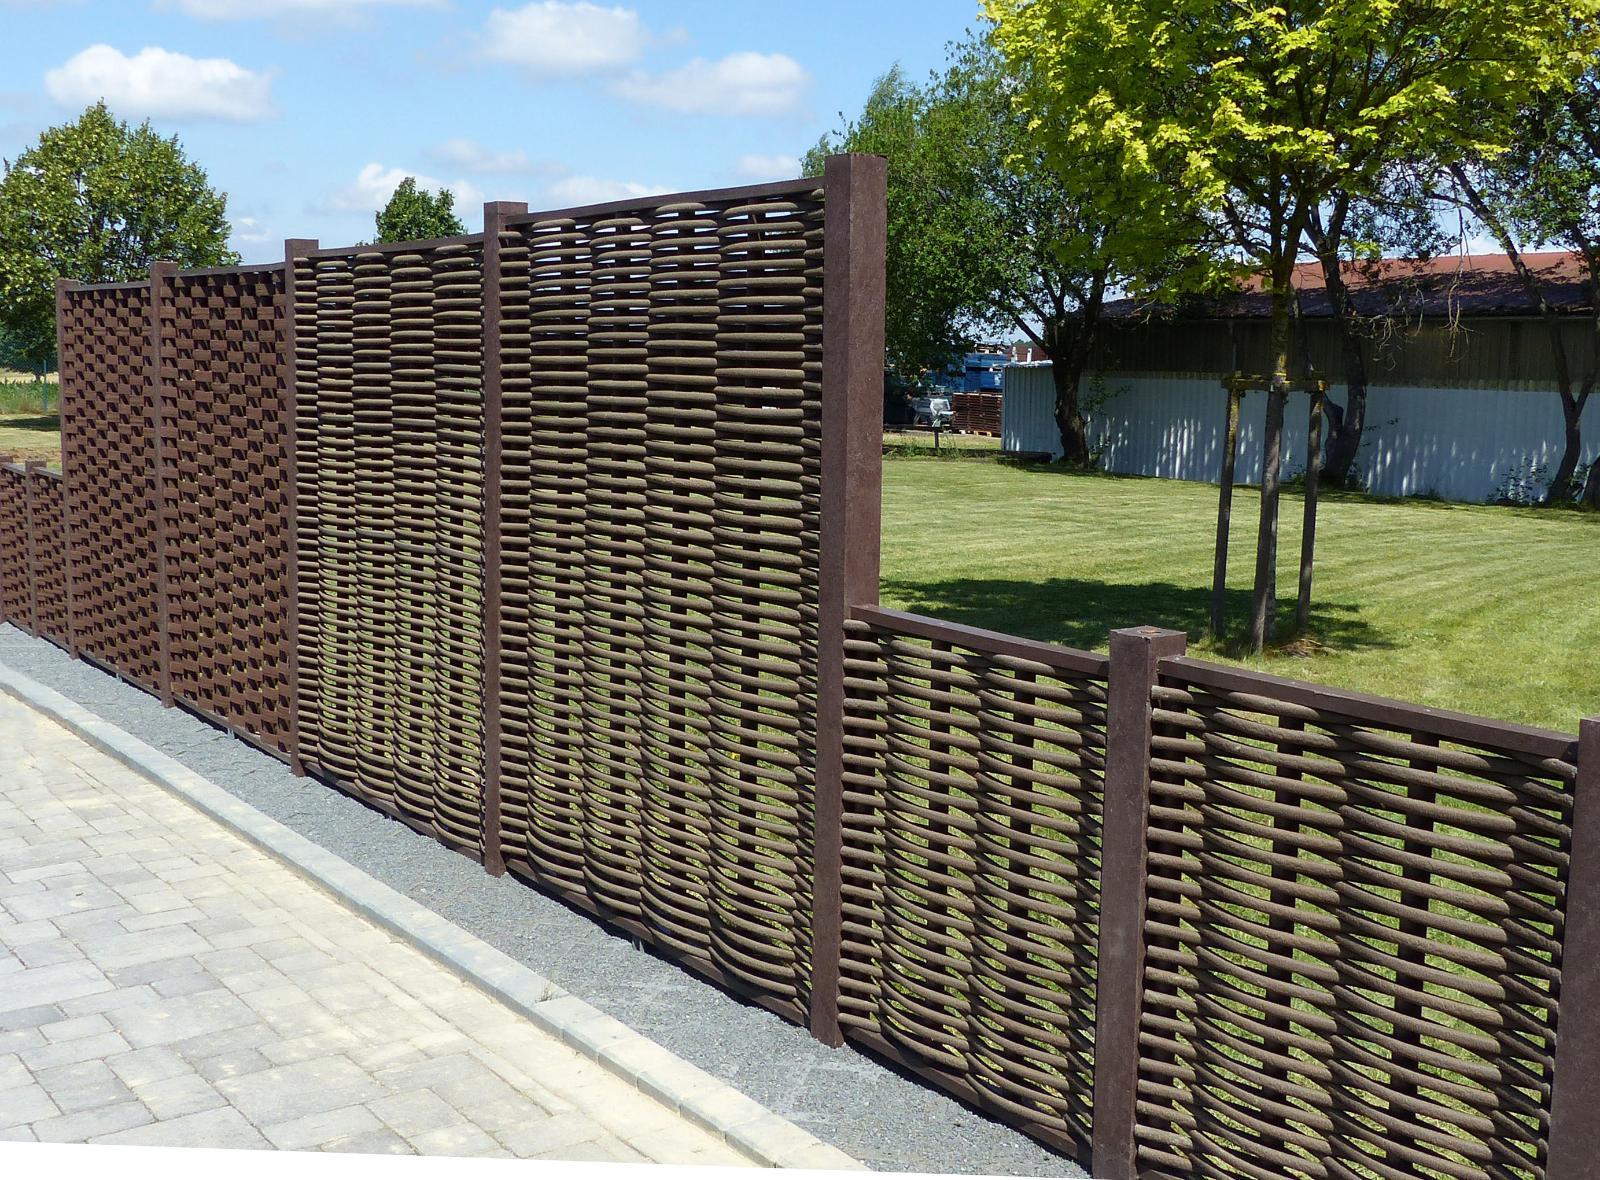 Flecht Sichtschutz Wand Element Recycling Kunststoff Amsdirekt